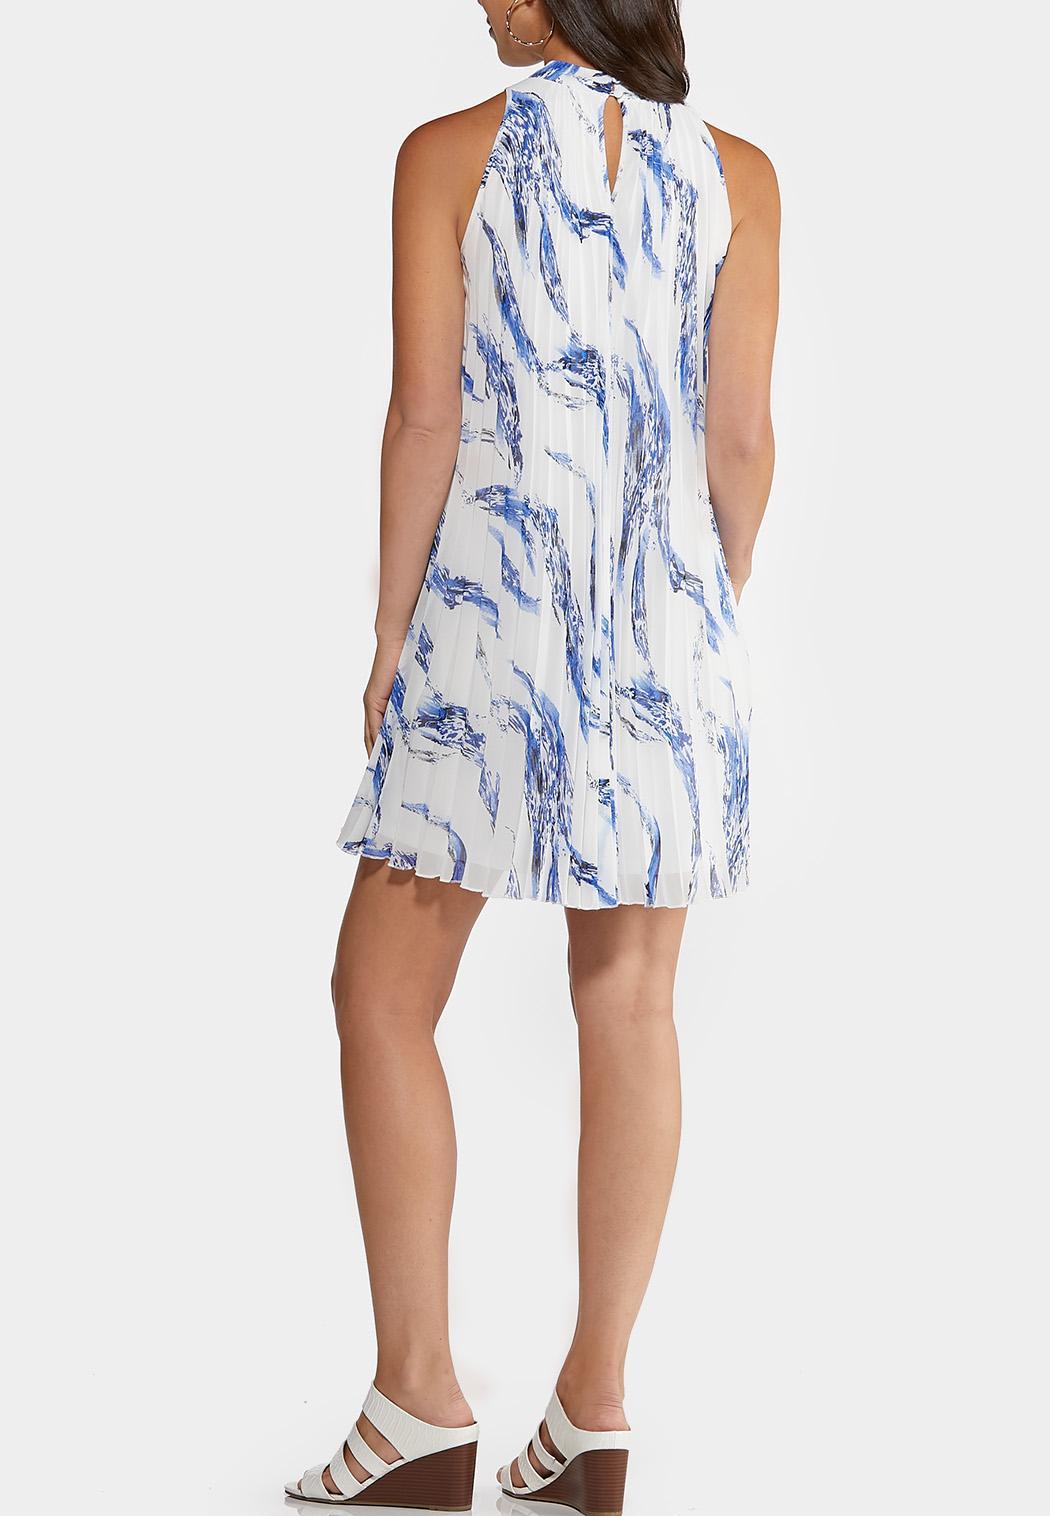 Plus Size Pleated Print Swing Dress (Item #43718383)